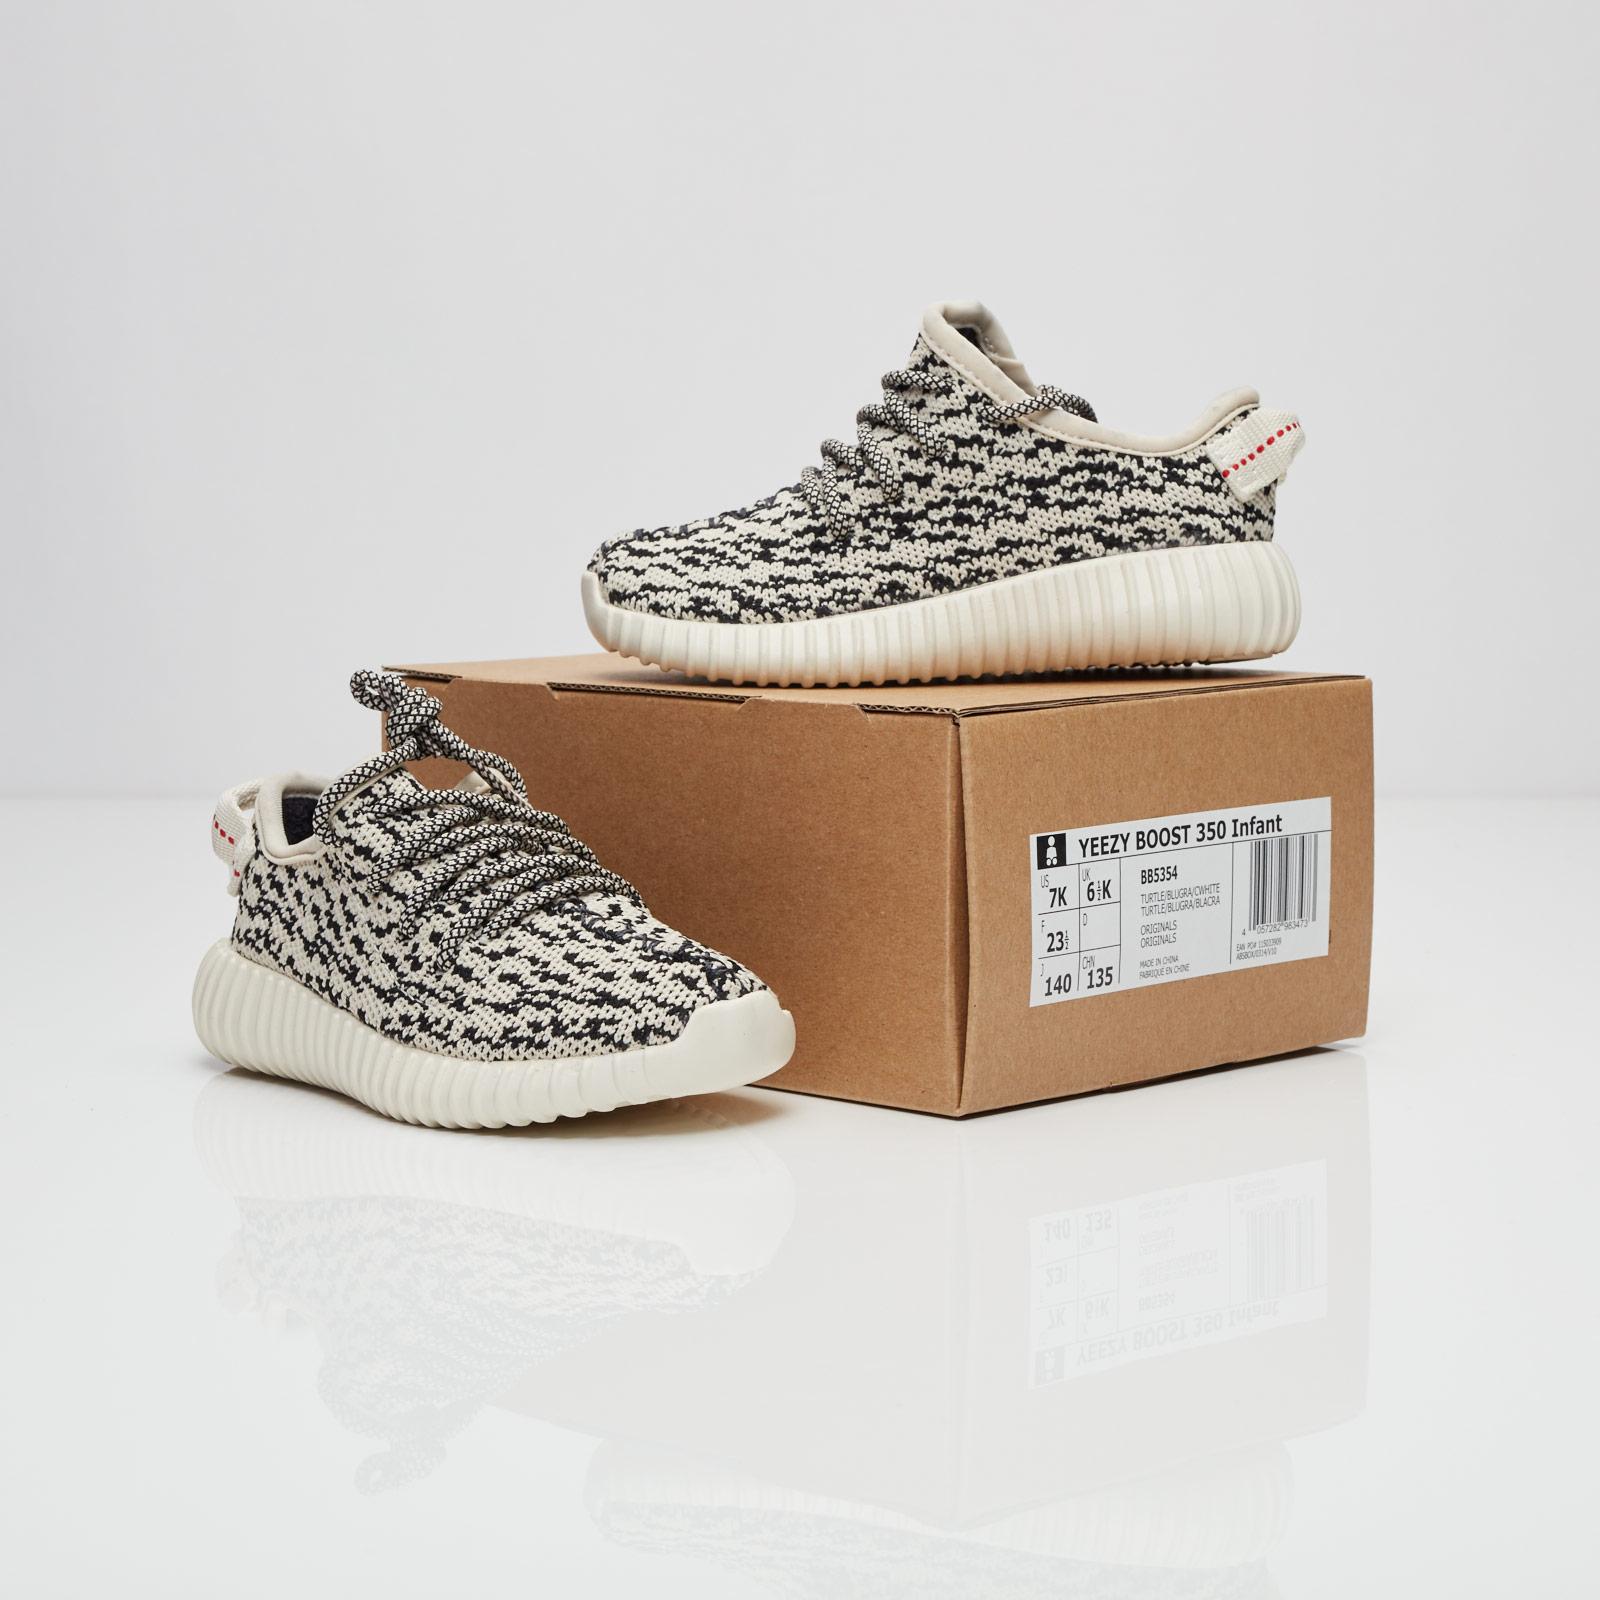 adidas Yeezy Boost 350 Infants - Bb5354